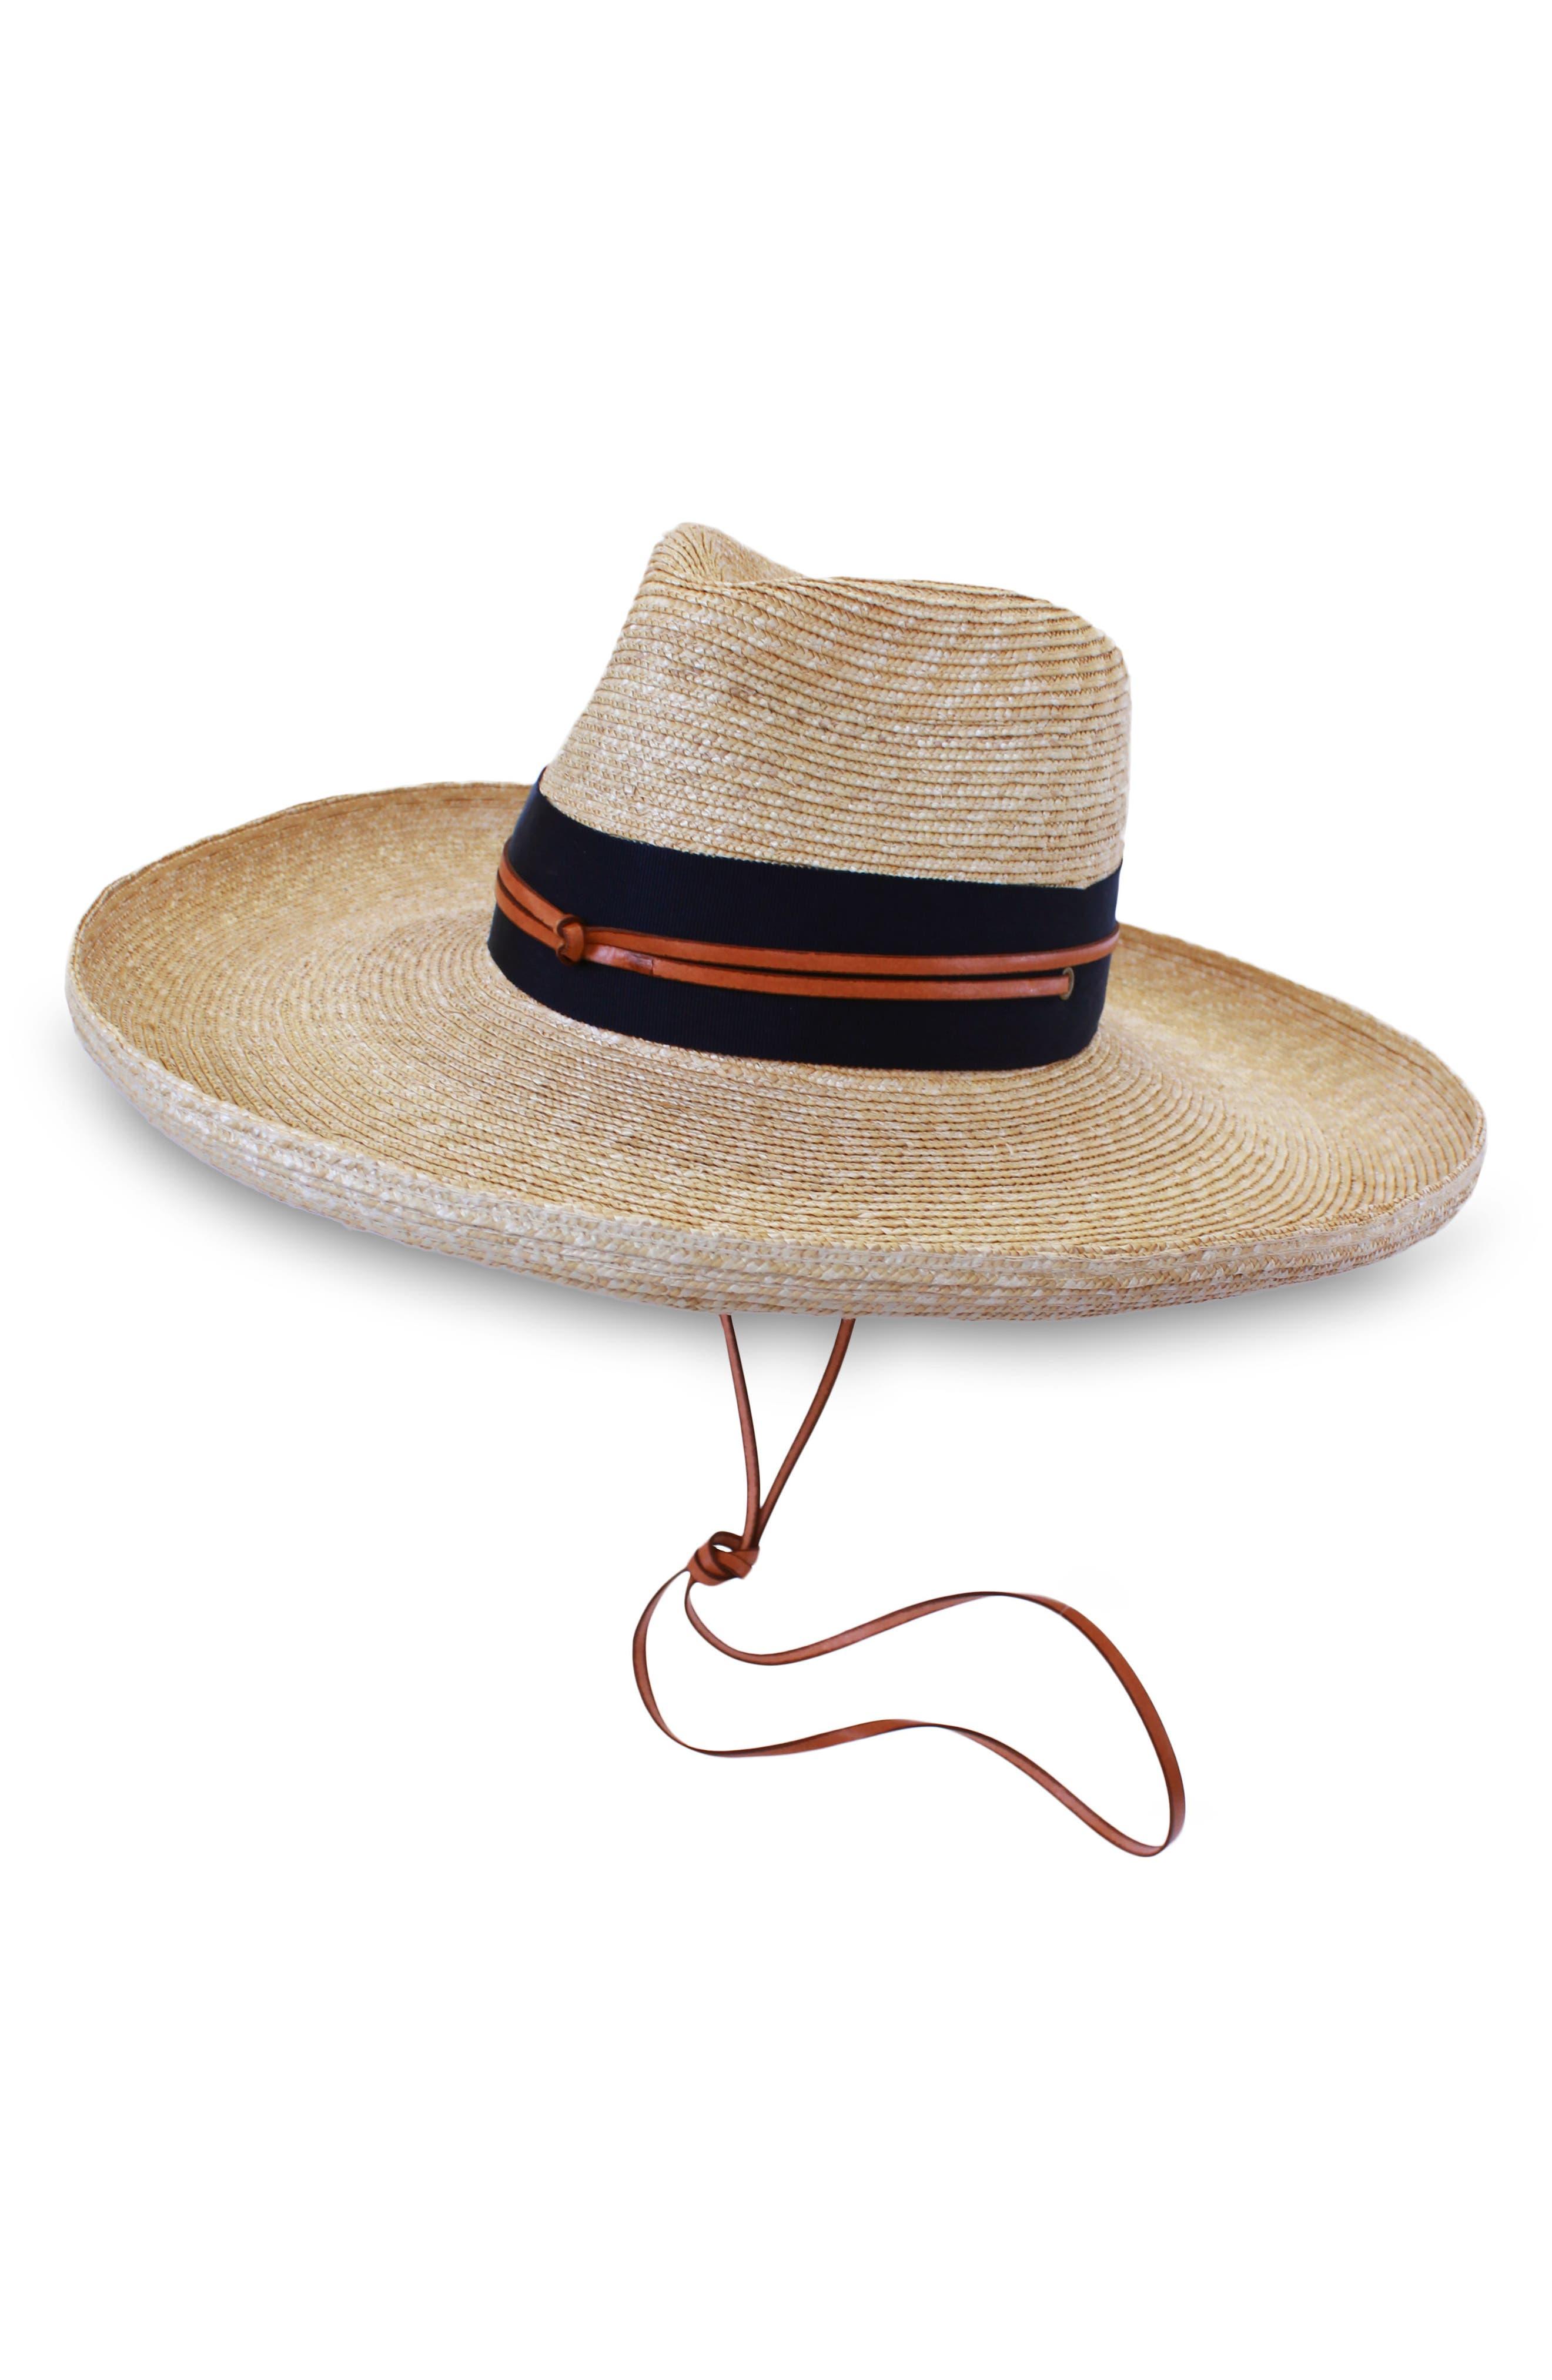 Comargo Raffia Hat,                             Main thumbnail 1, color,                             NATURAL/ NAVY